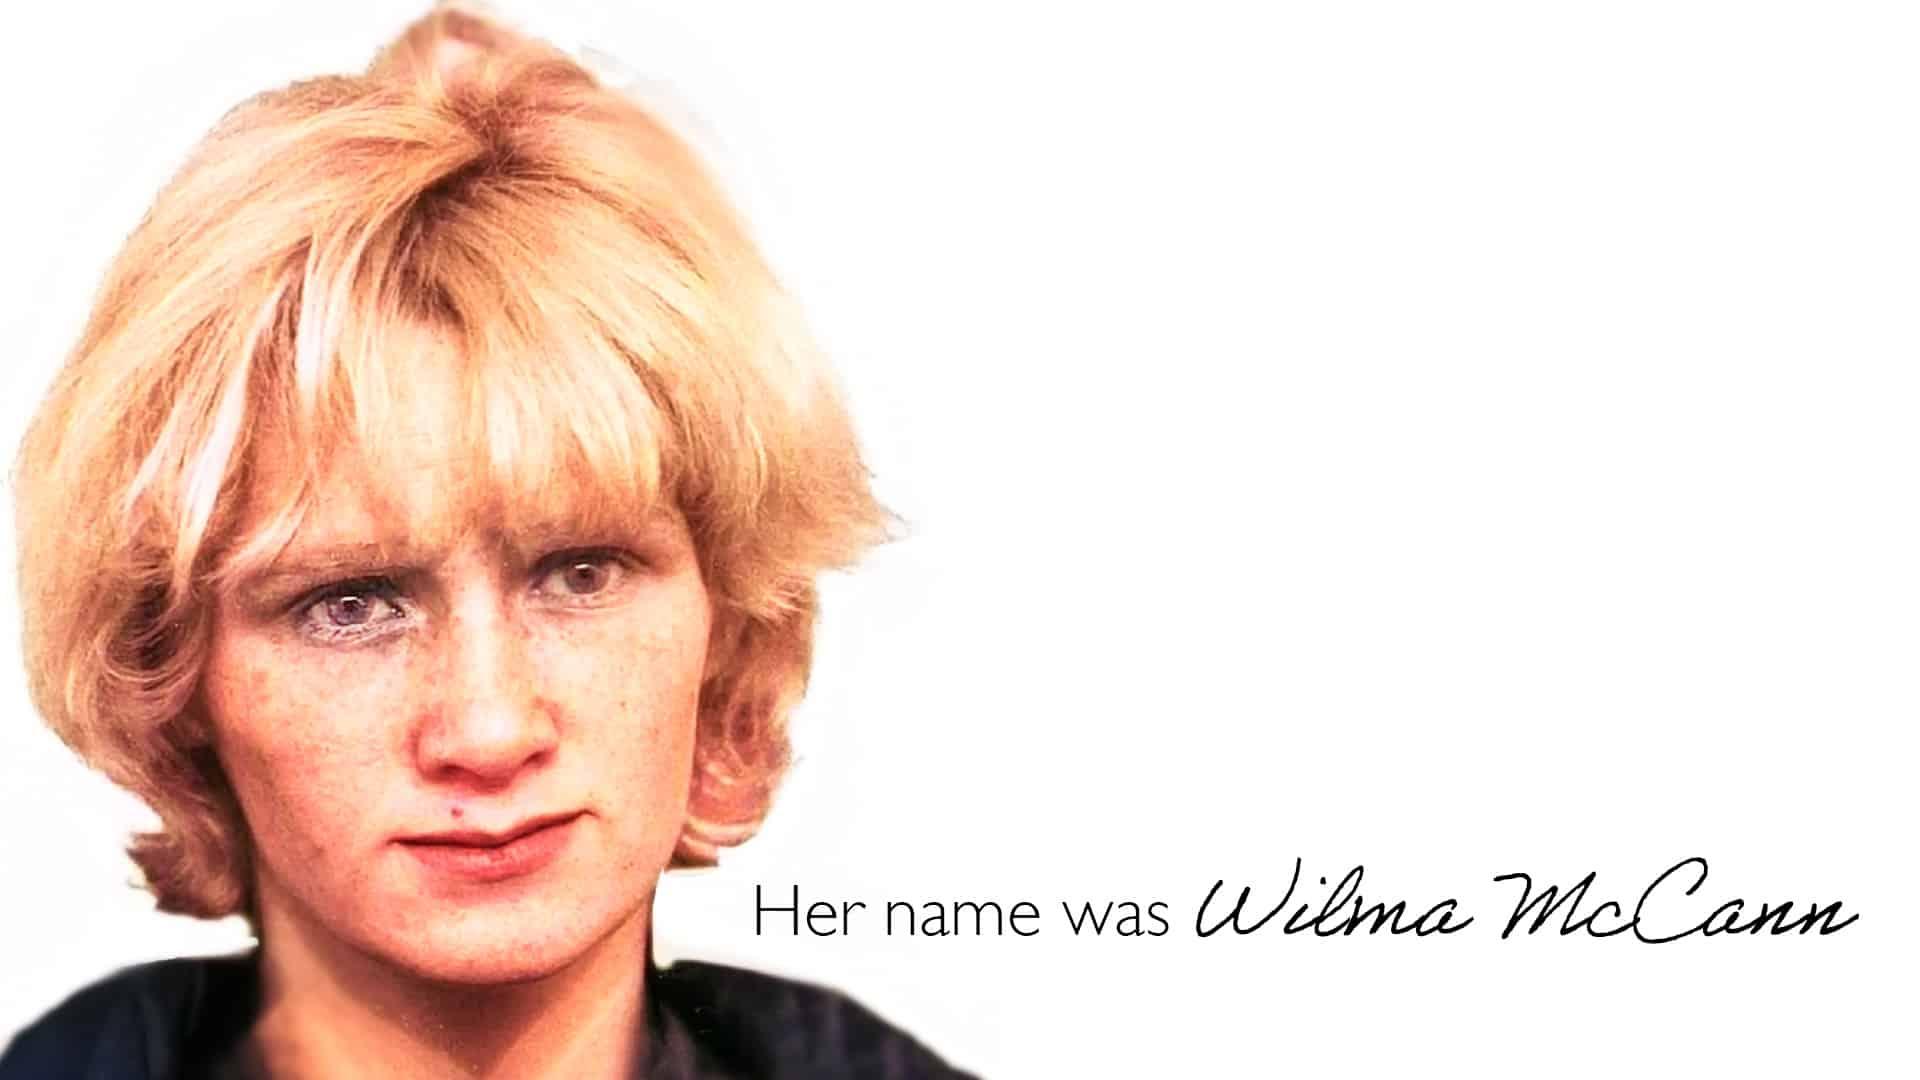 Photograph of Wilma McCann